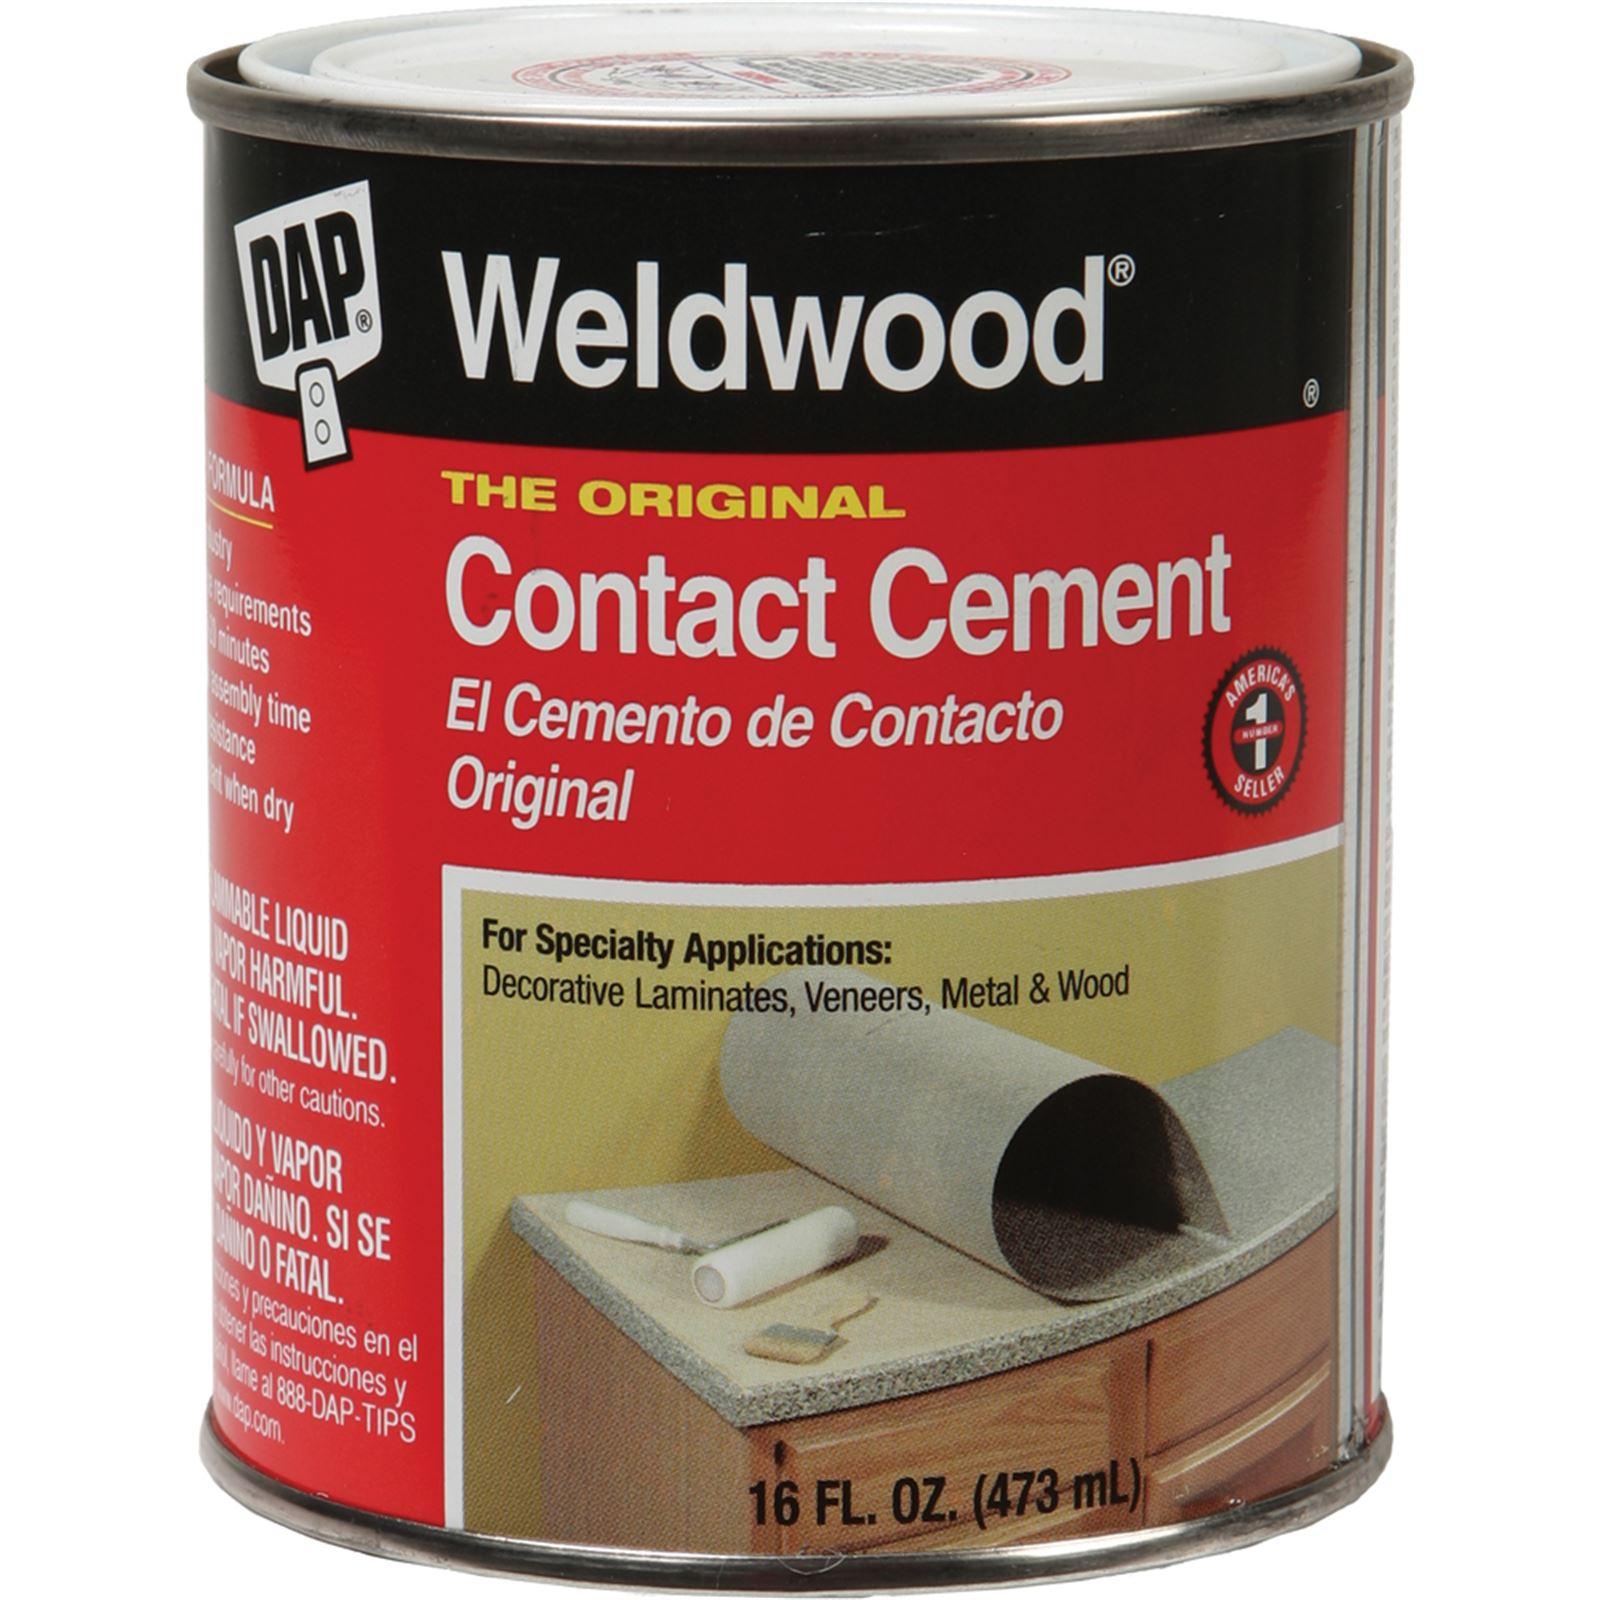 Hydro-Turf Marine Contact Cement